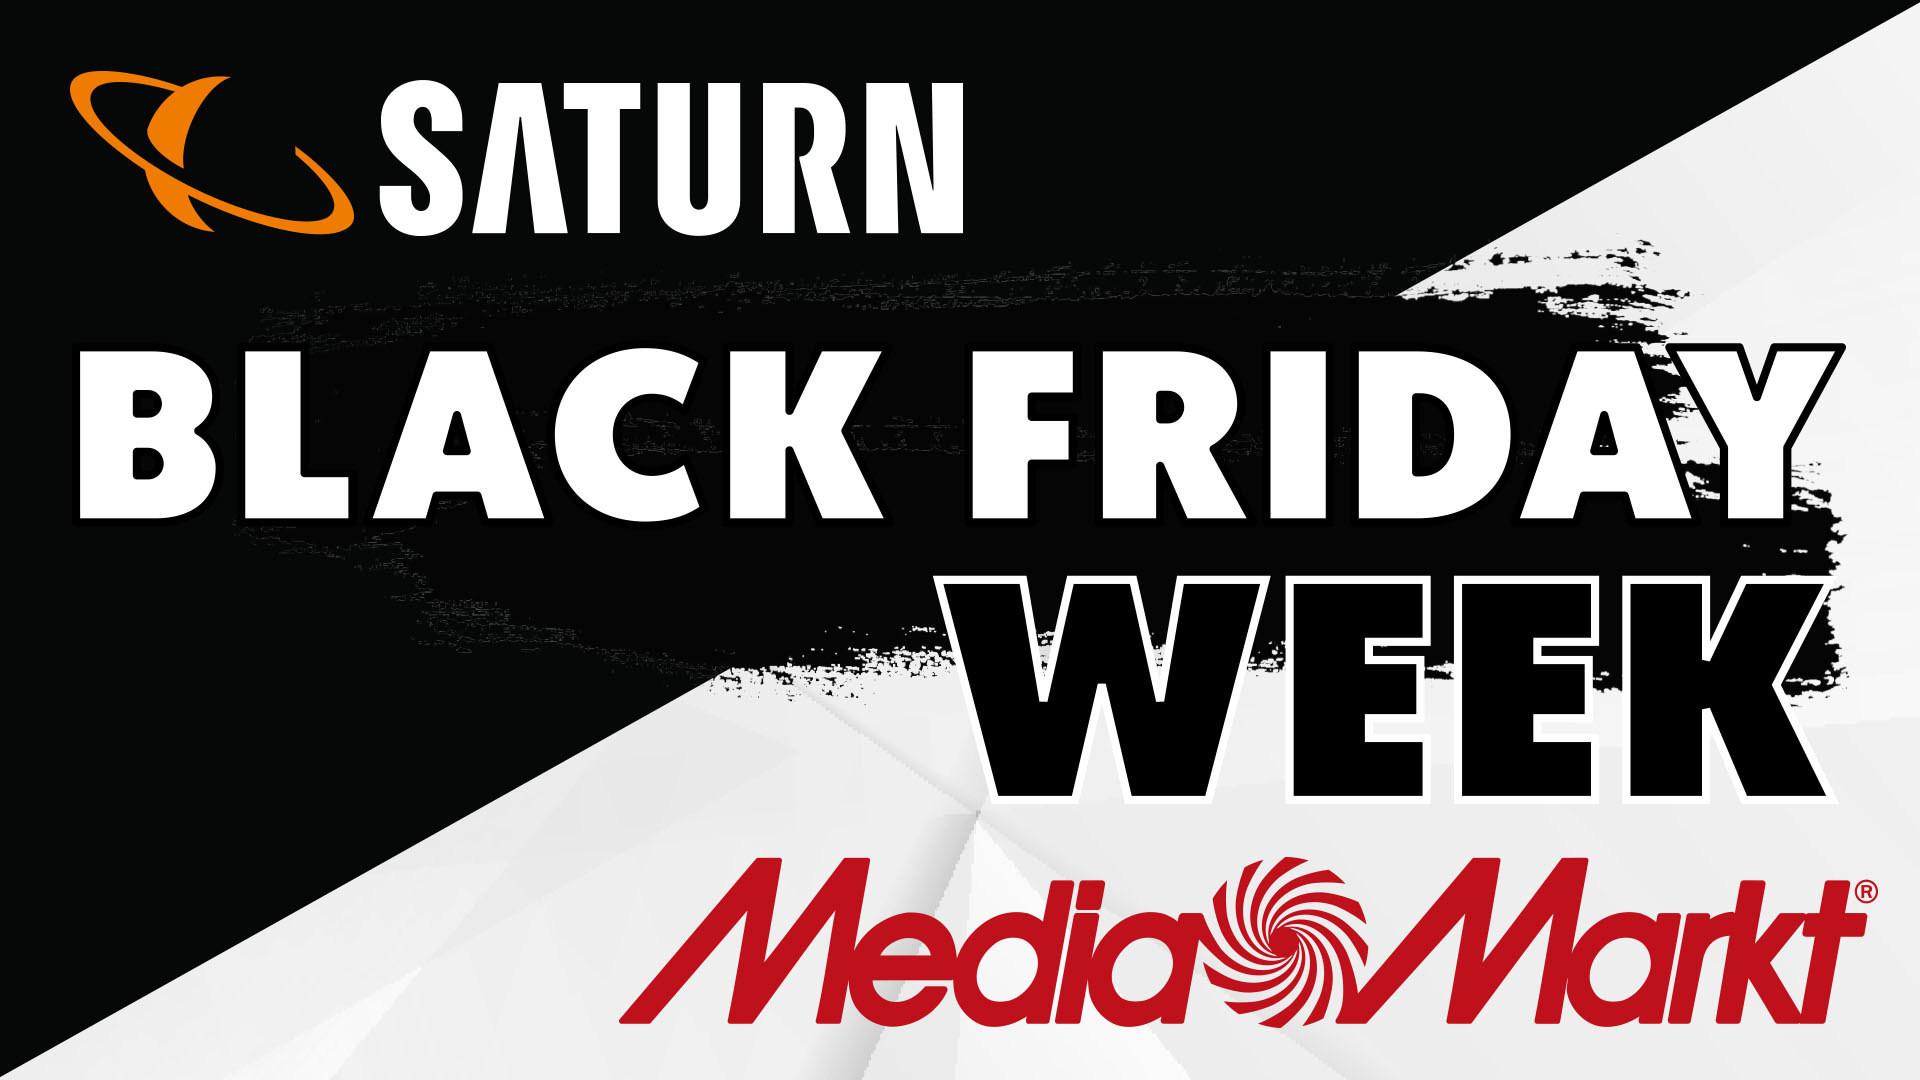 Saturn, Media Markt, Mediamarkt, Black Friday Woche, Black Friday Week, Kombination, Kombi